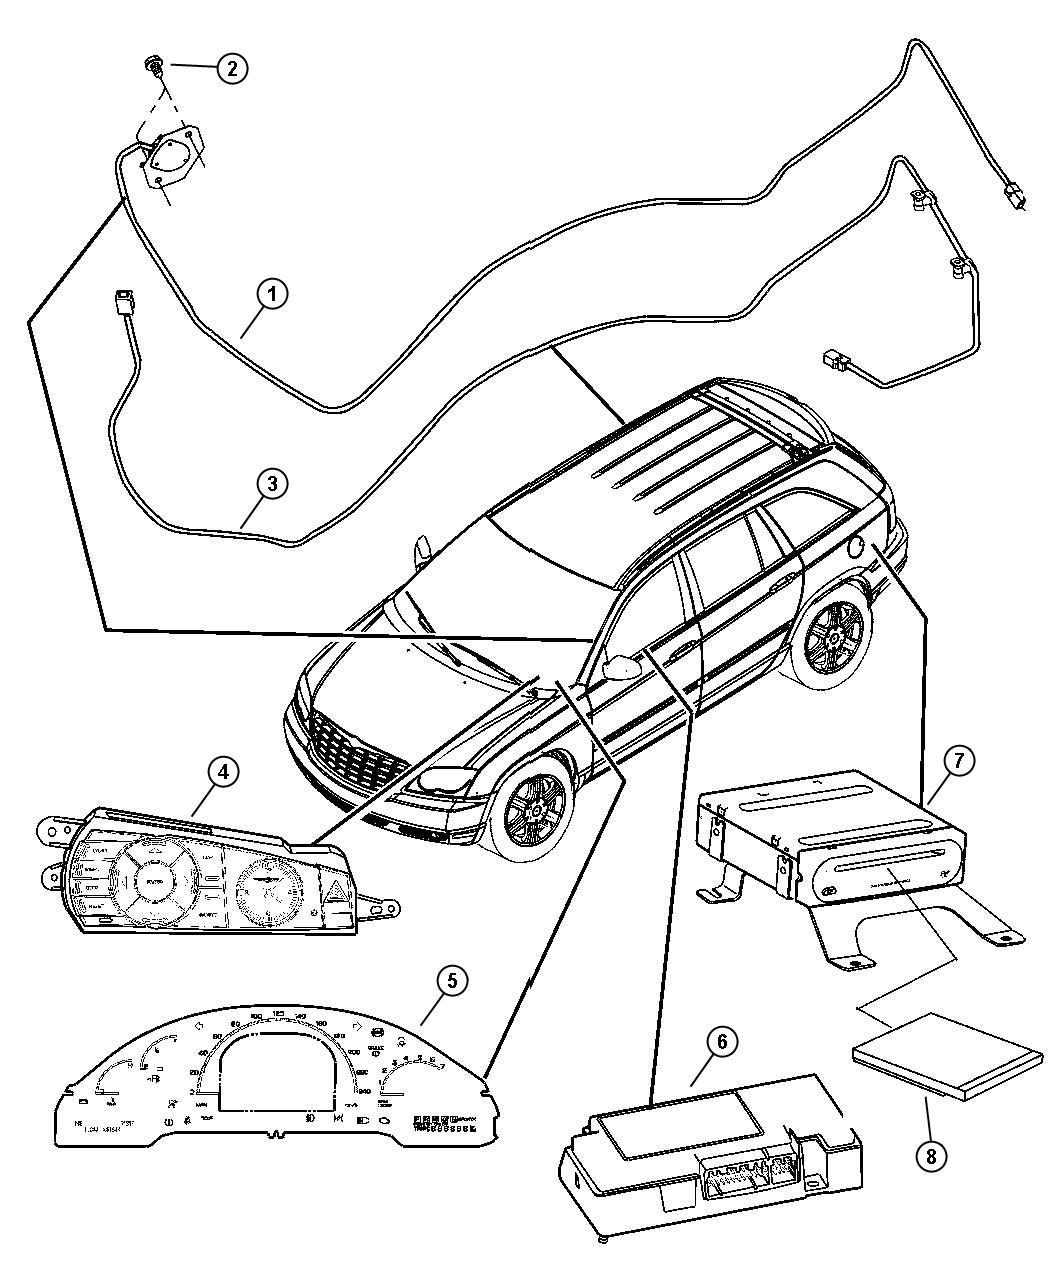 2006 Chrysler Pacifica Navigation System